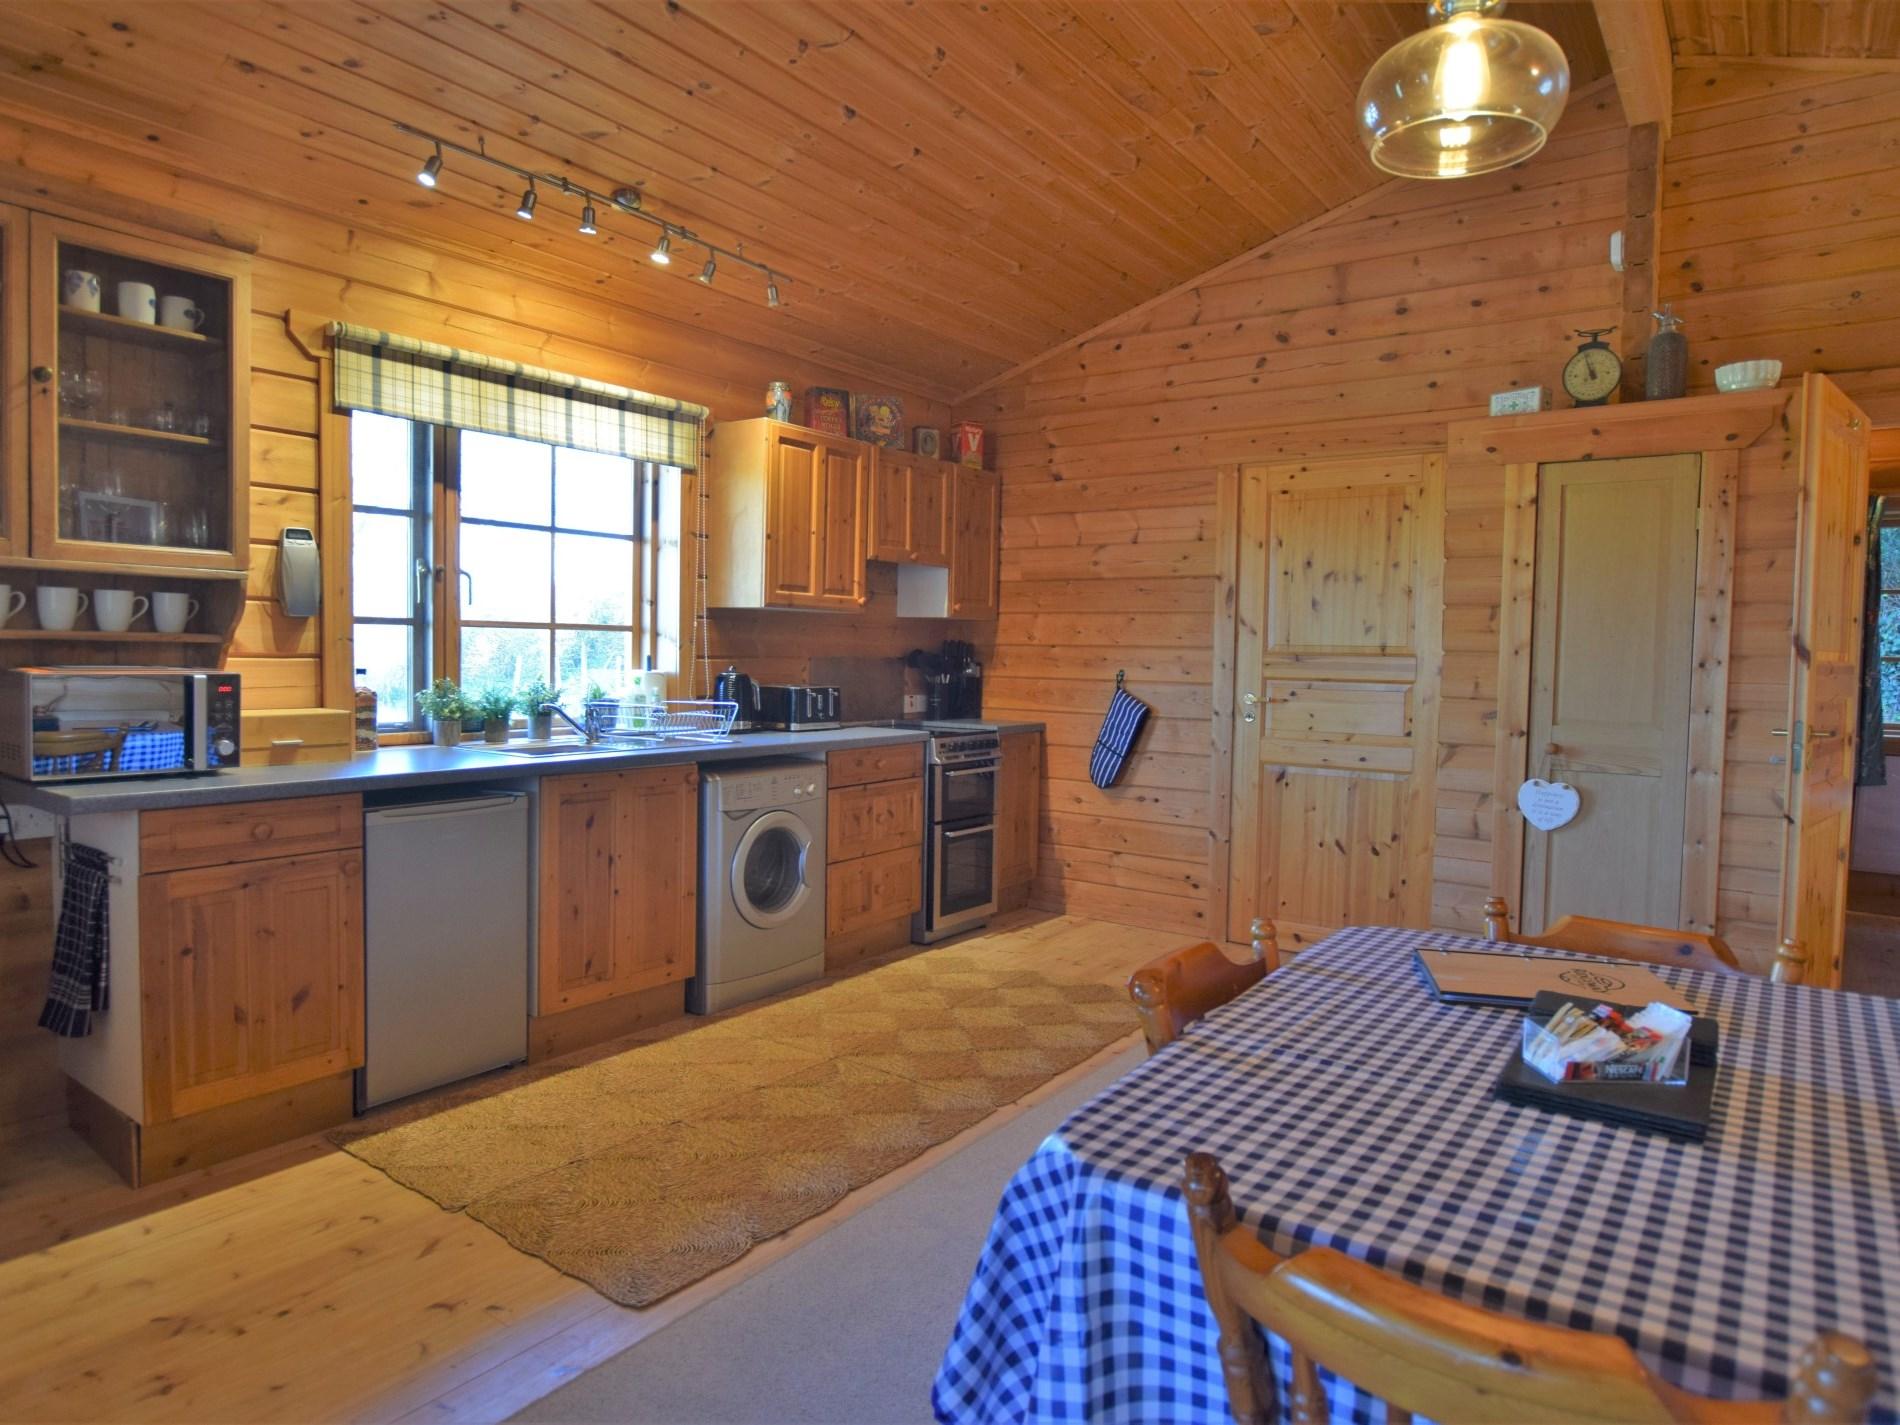 2 Bedroom Cottage in Blandford Forum, Dorset and Somerset